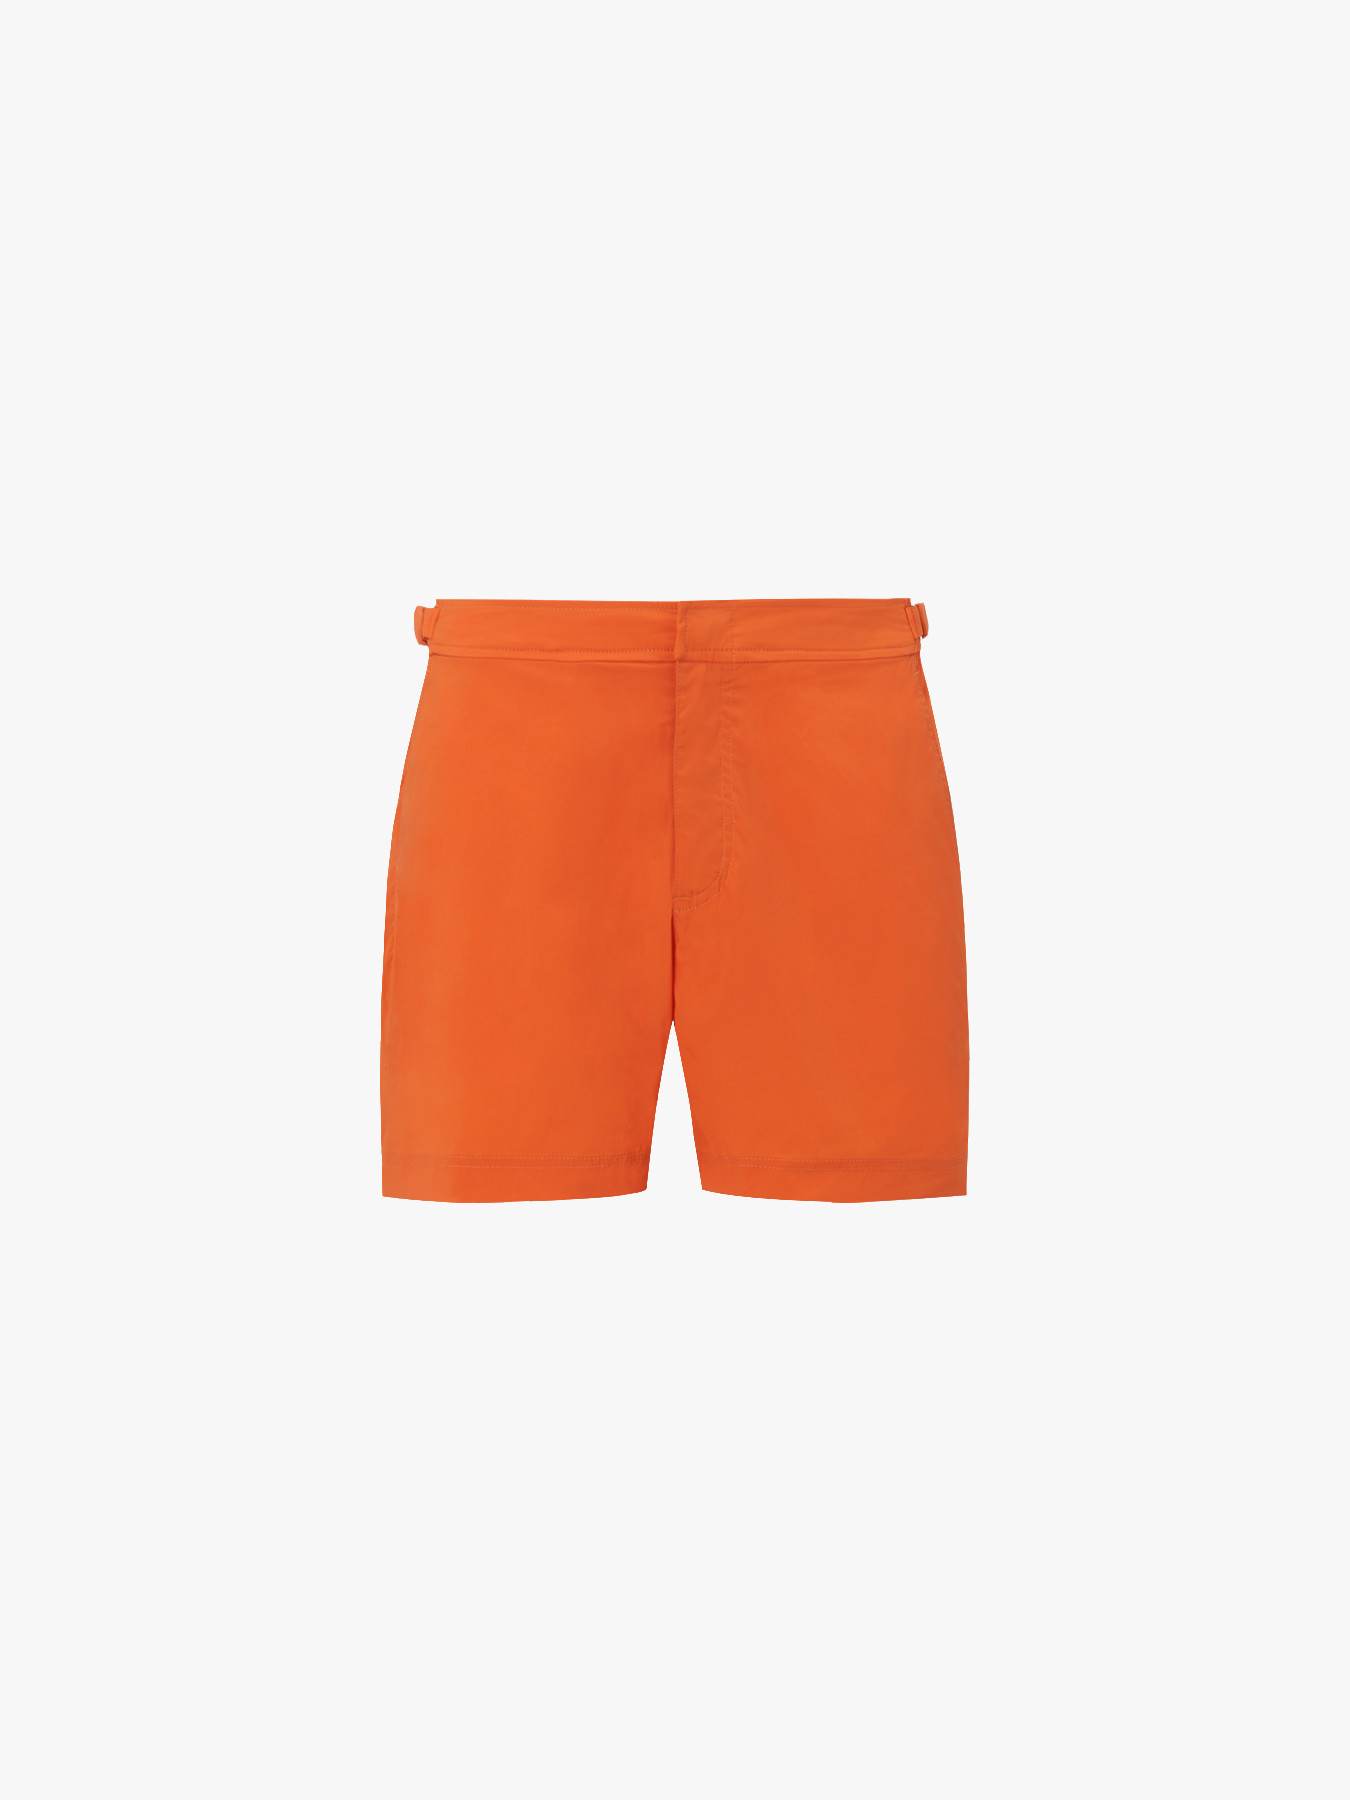 a9806fb52d Orlebar Brown Bulldog Sport Swim Short | Shorts | Fenwick